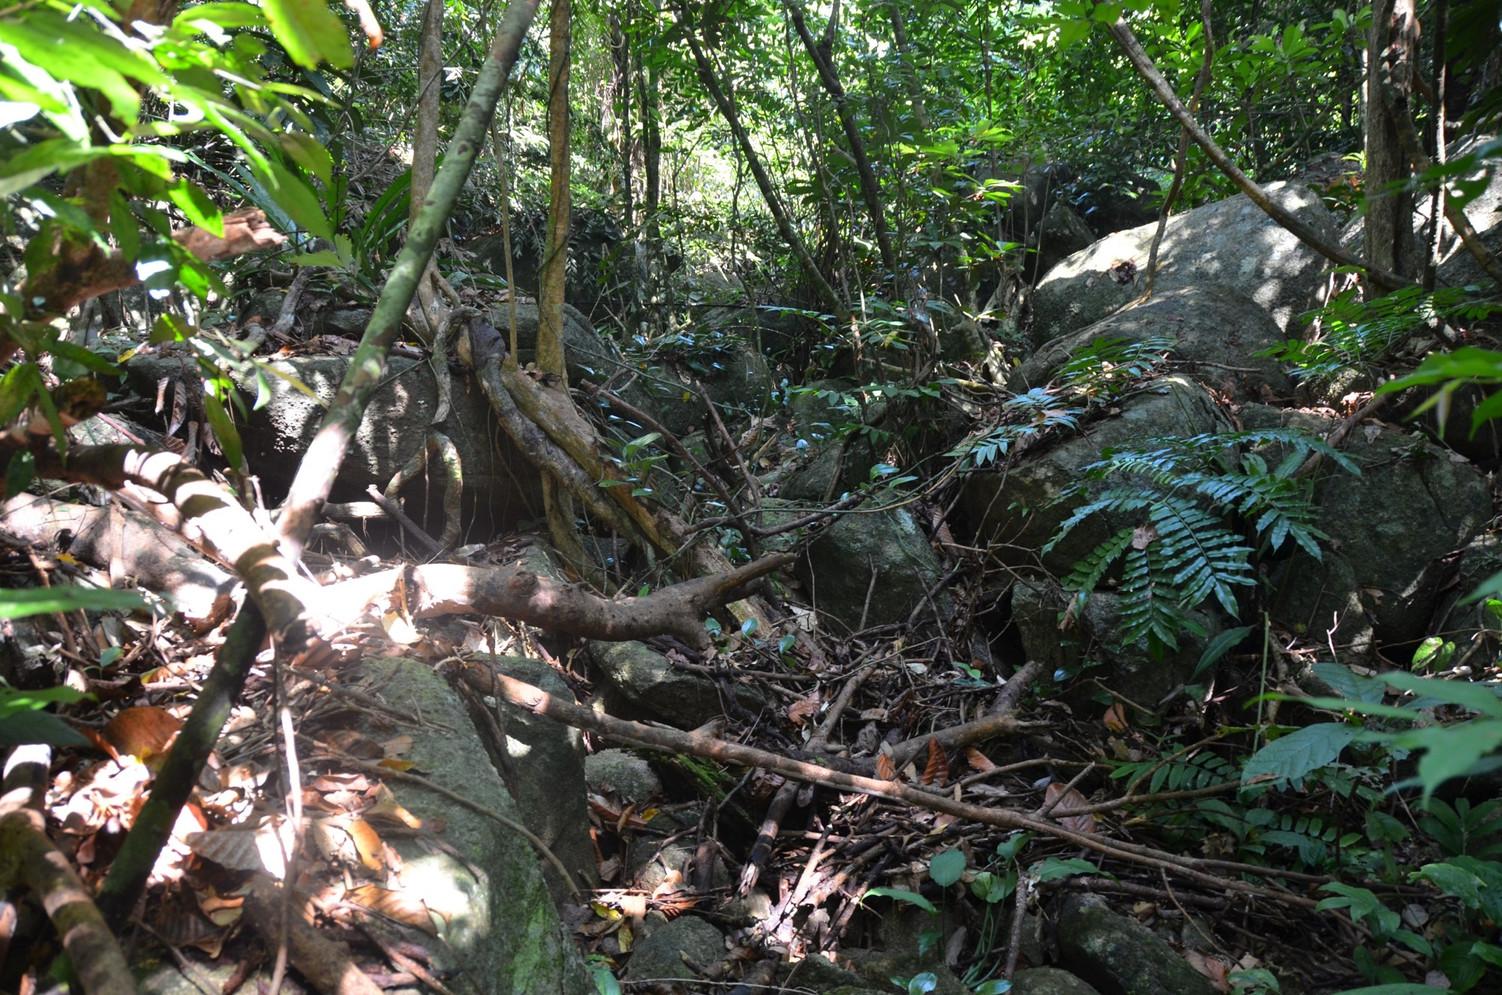 Habitat of Cuora mouhotii obsti